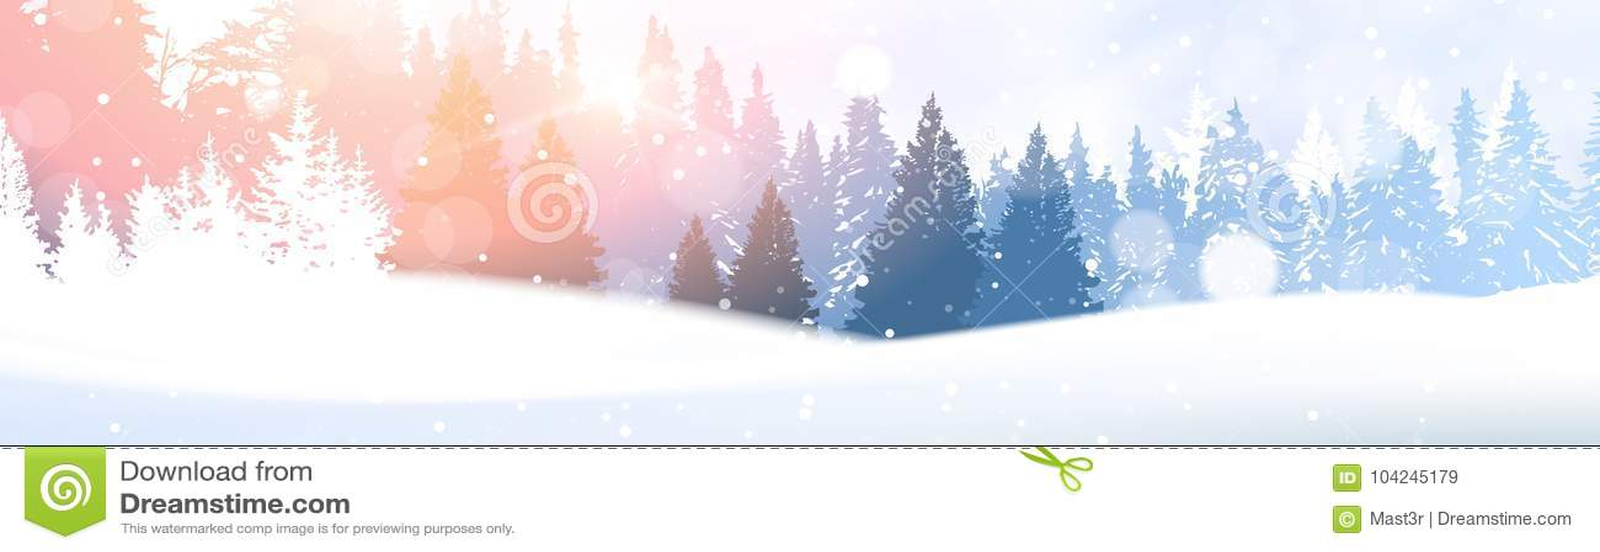 Day In Winter Forest Glowing Snow Under Sunshine Woodland Landscape White Snowy Pine Tree Woods Background